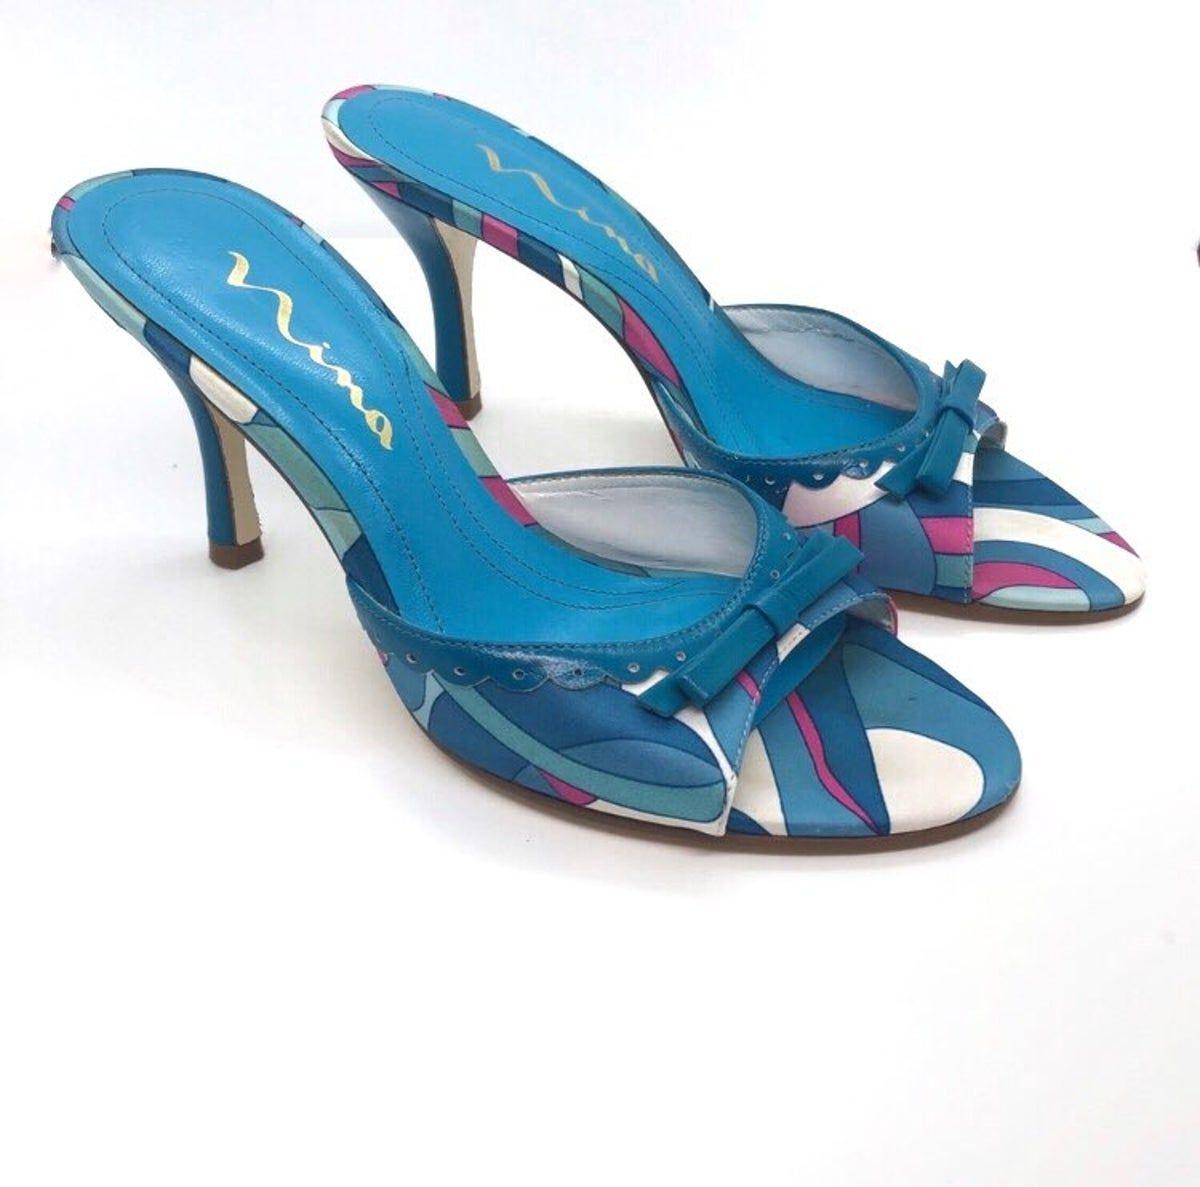 Nina Turquoise Blue Kitten Heels Retro 7 In 2020 Kitten Heels Heels Retro 7